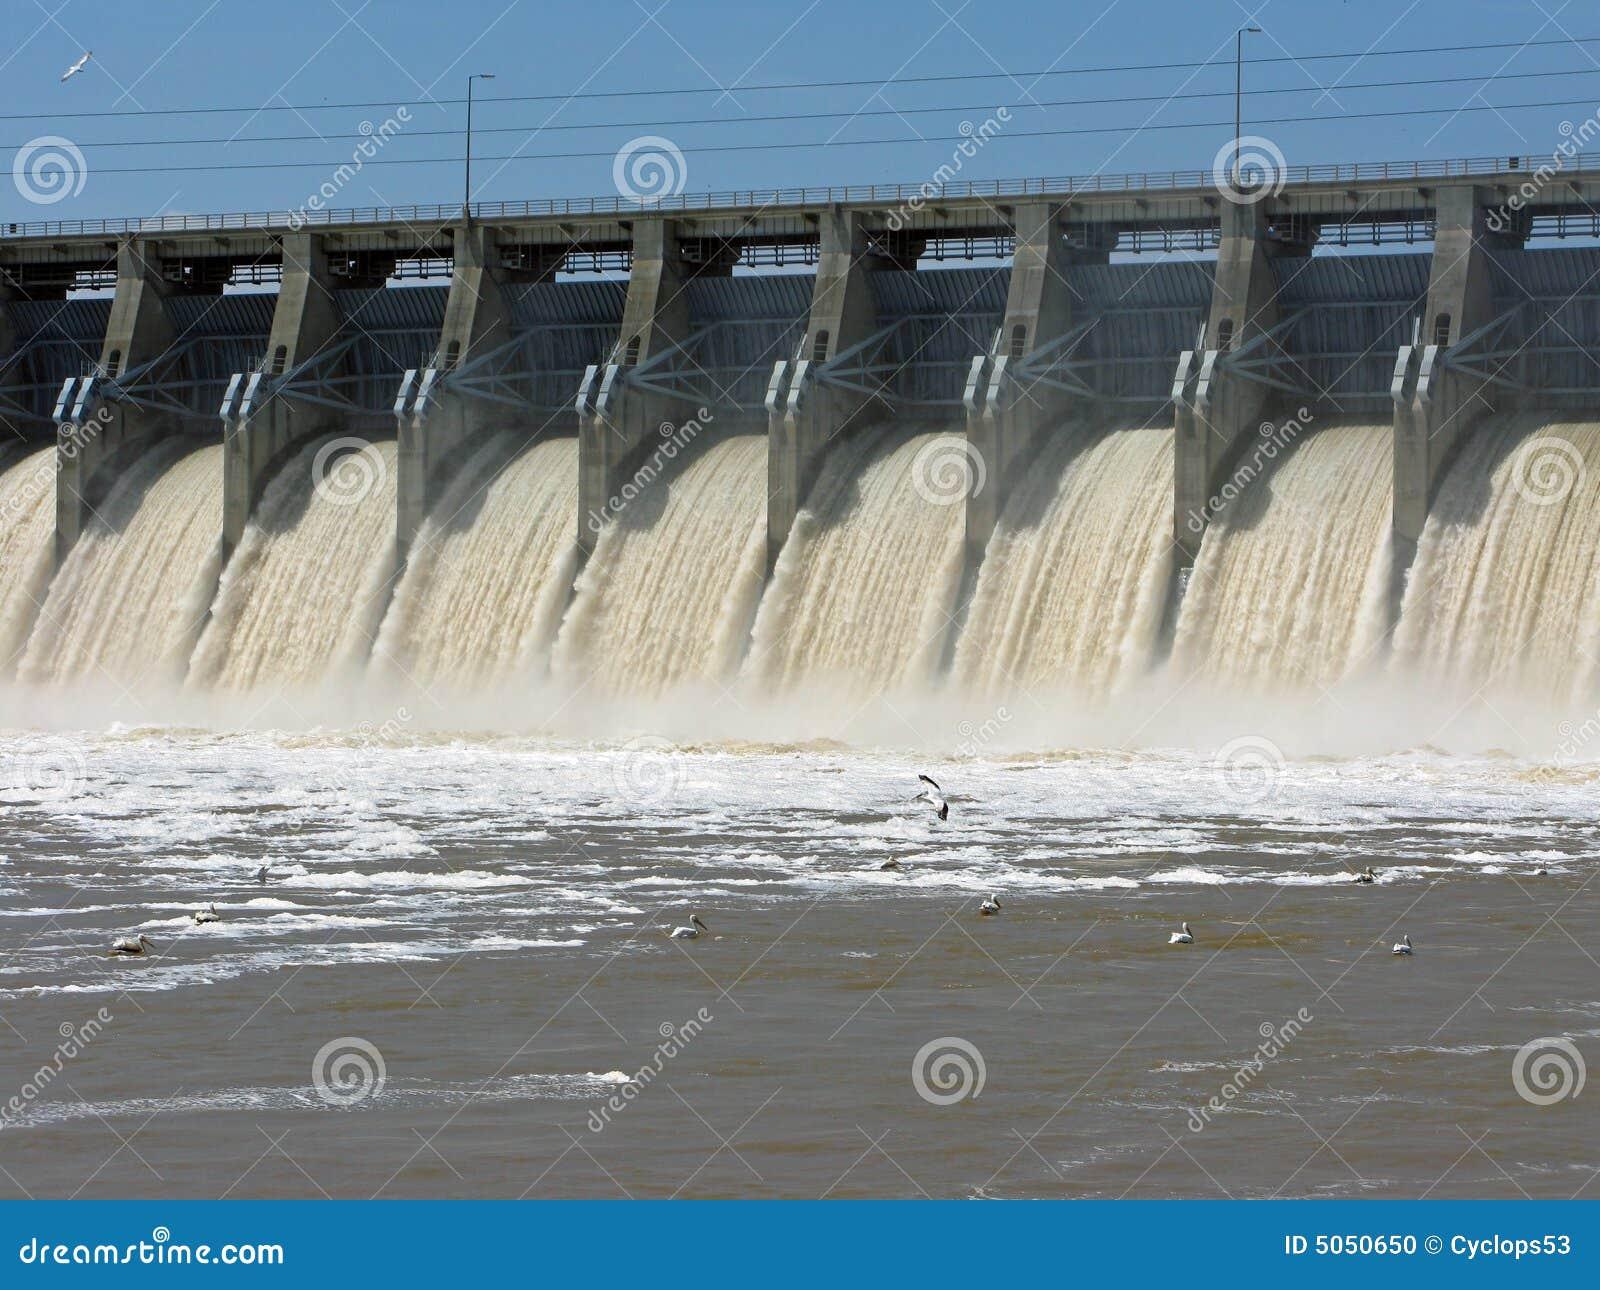 Pelicans fishing below the dam